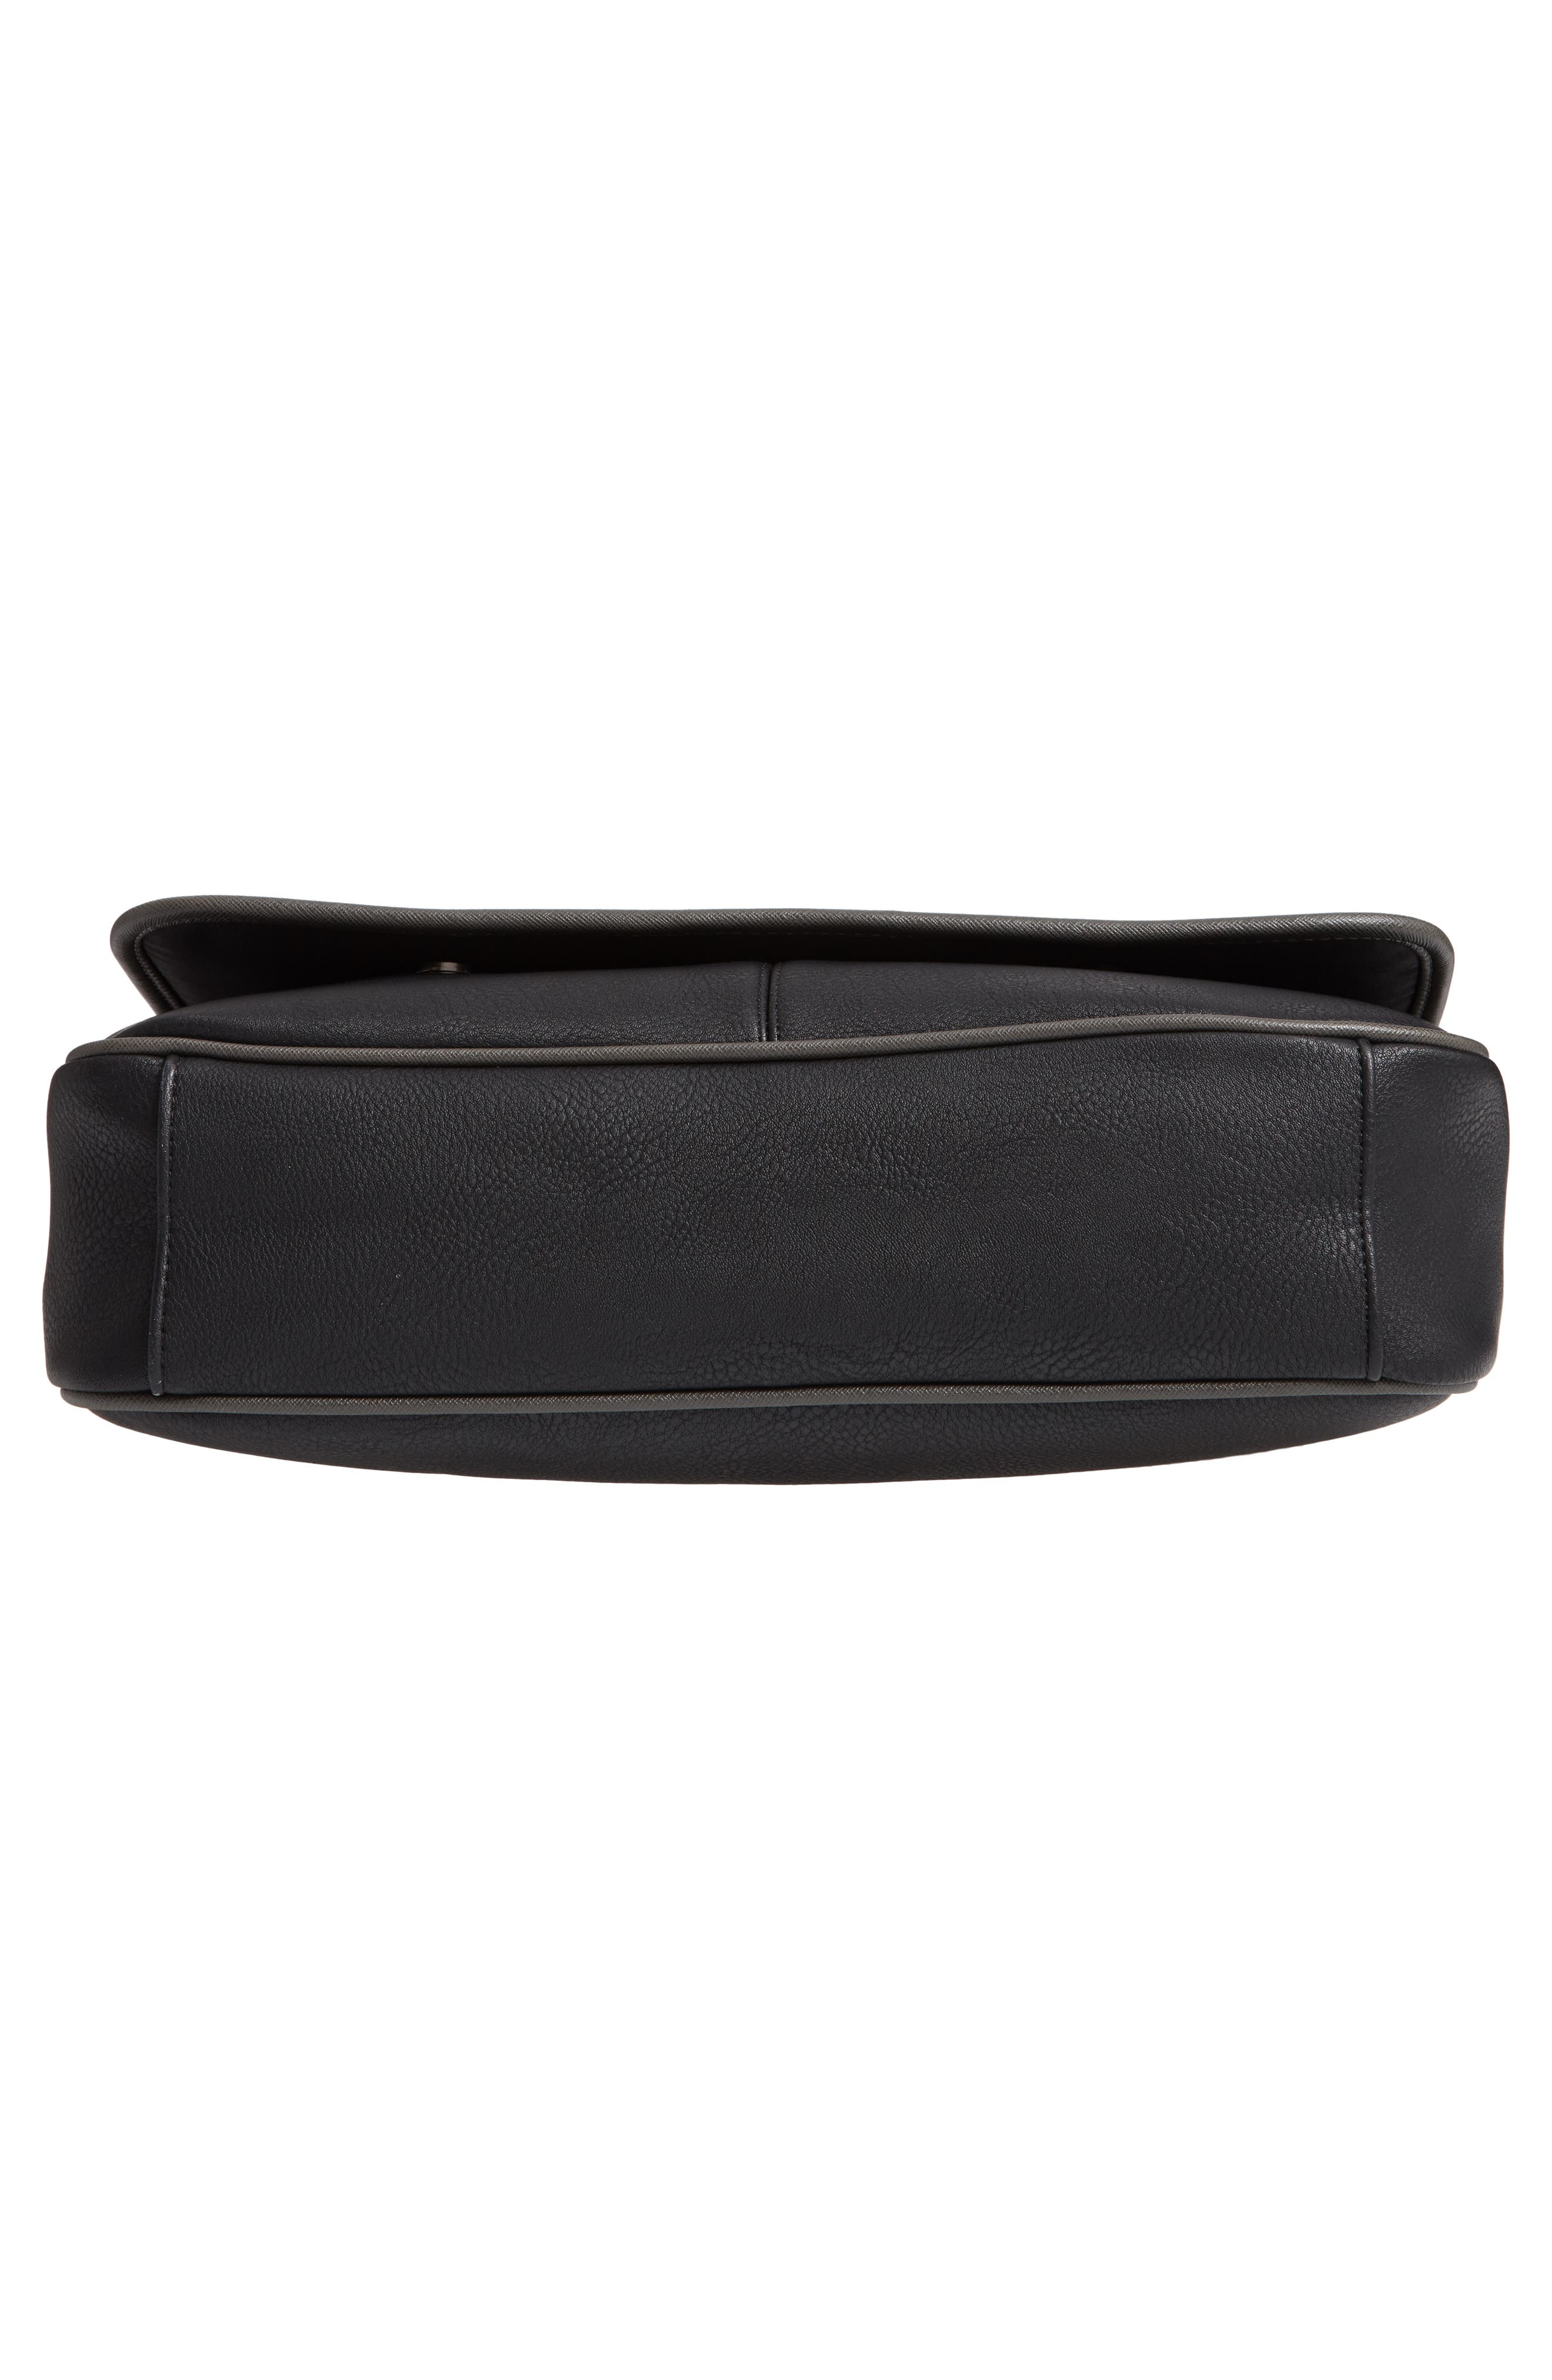 Kingcol Faux Leather Messenger Bag,                             Alternate thumbnail 5, color,                             Black